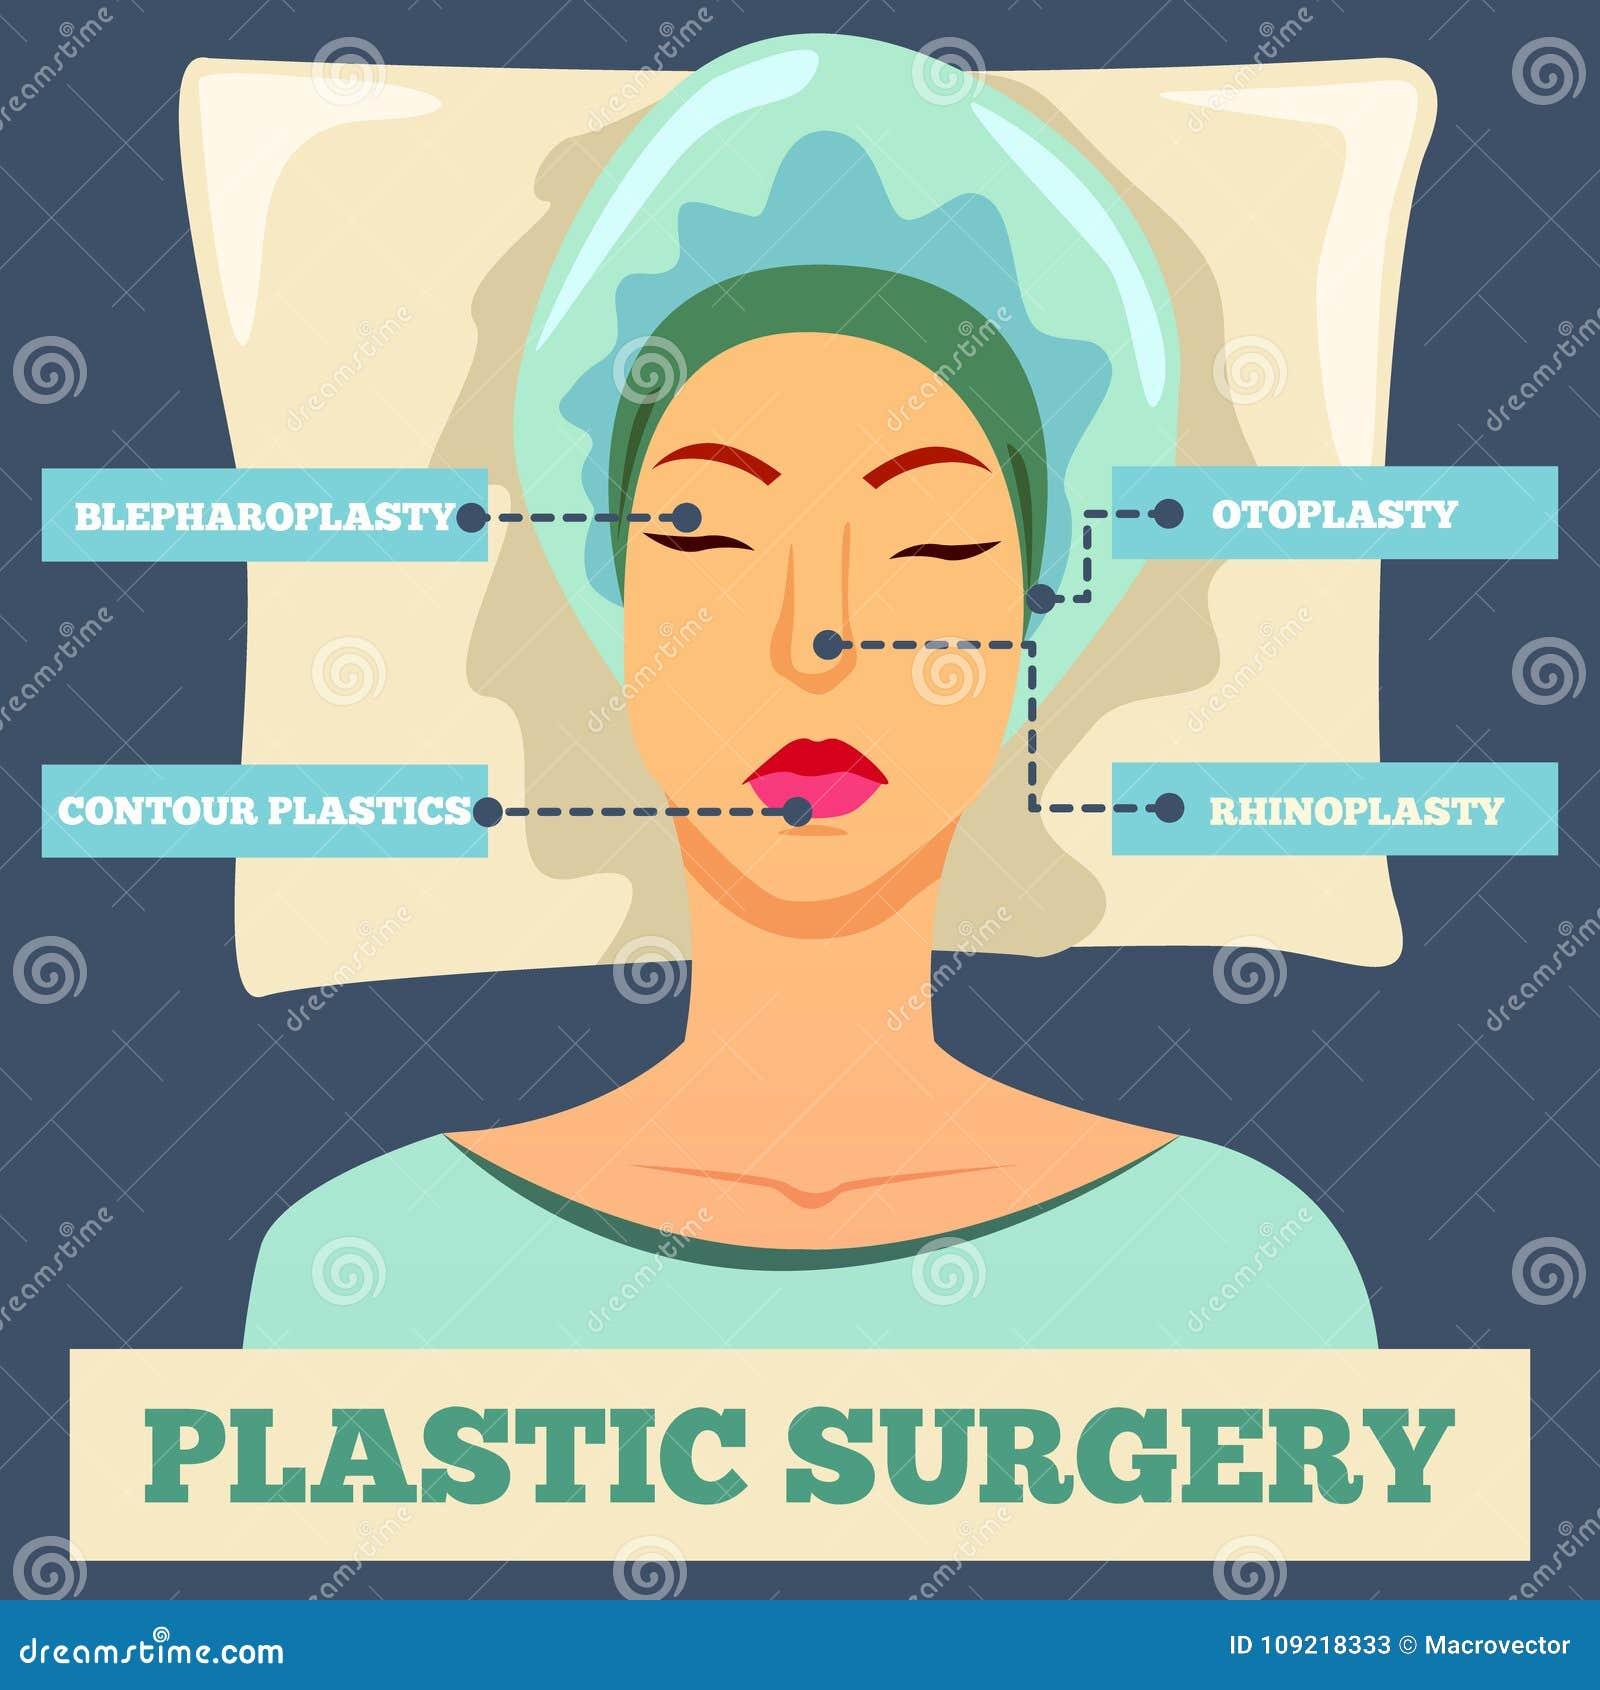 Plastic Surgery Orthogonal Flat Background Stock Vector